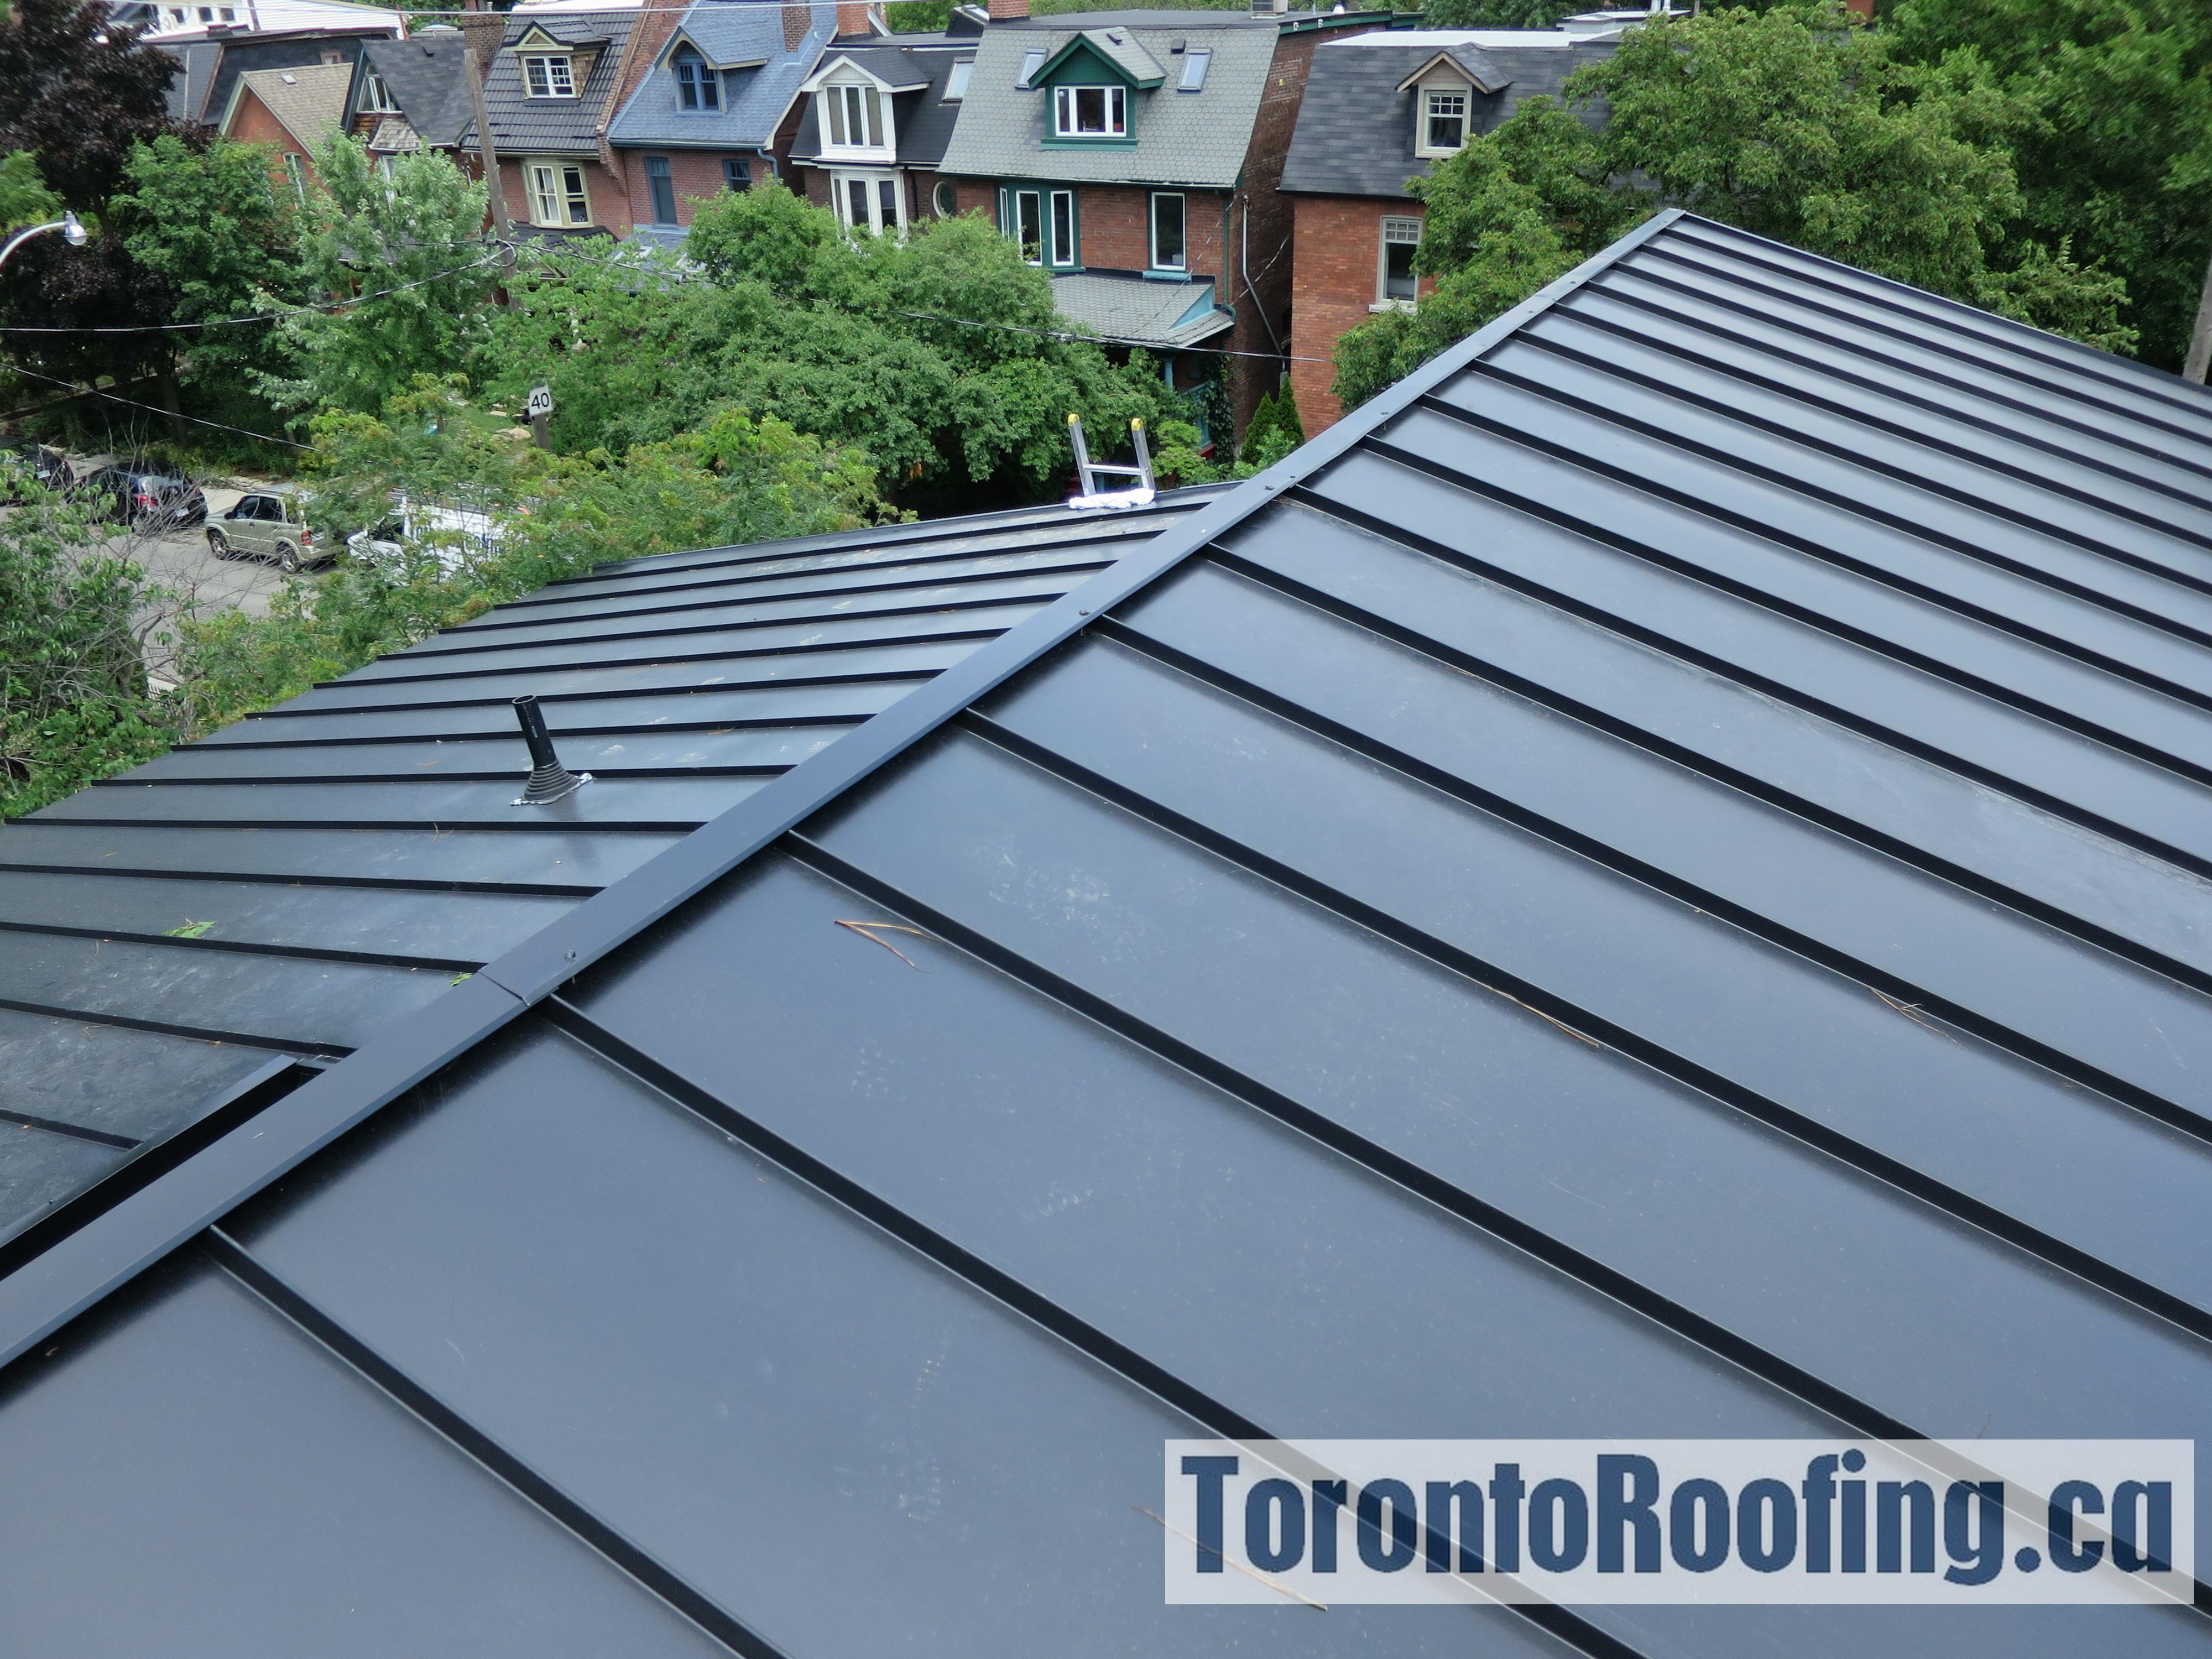 Standing Seam Metal Roofing Torontoroofing Ca